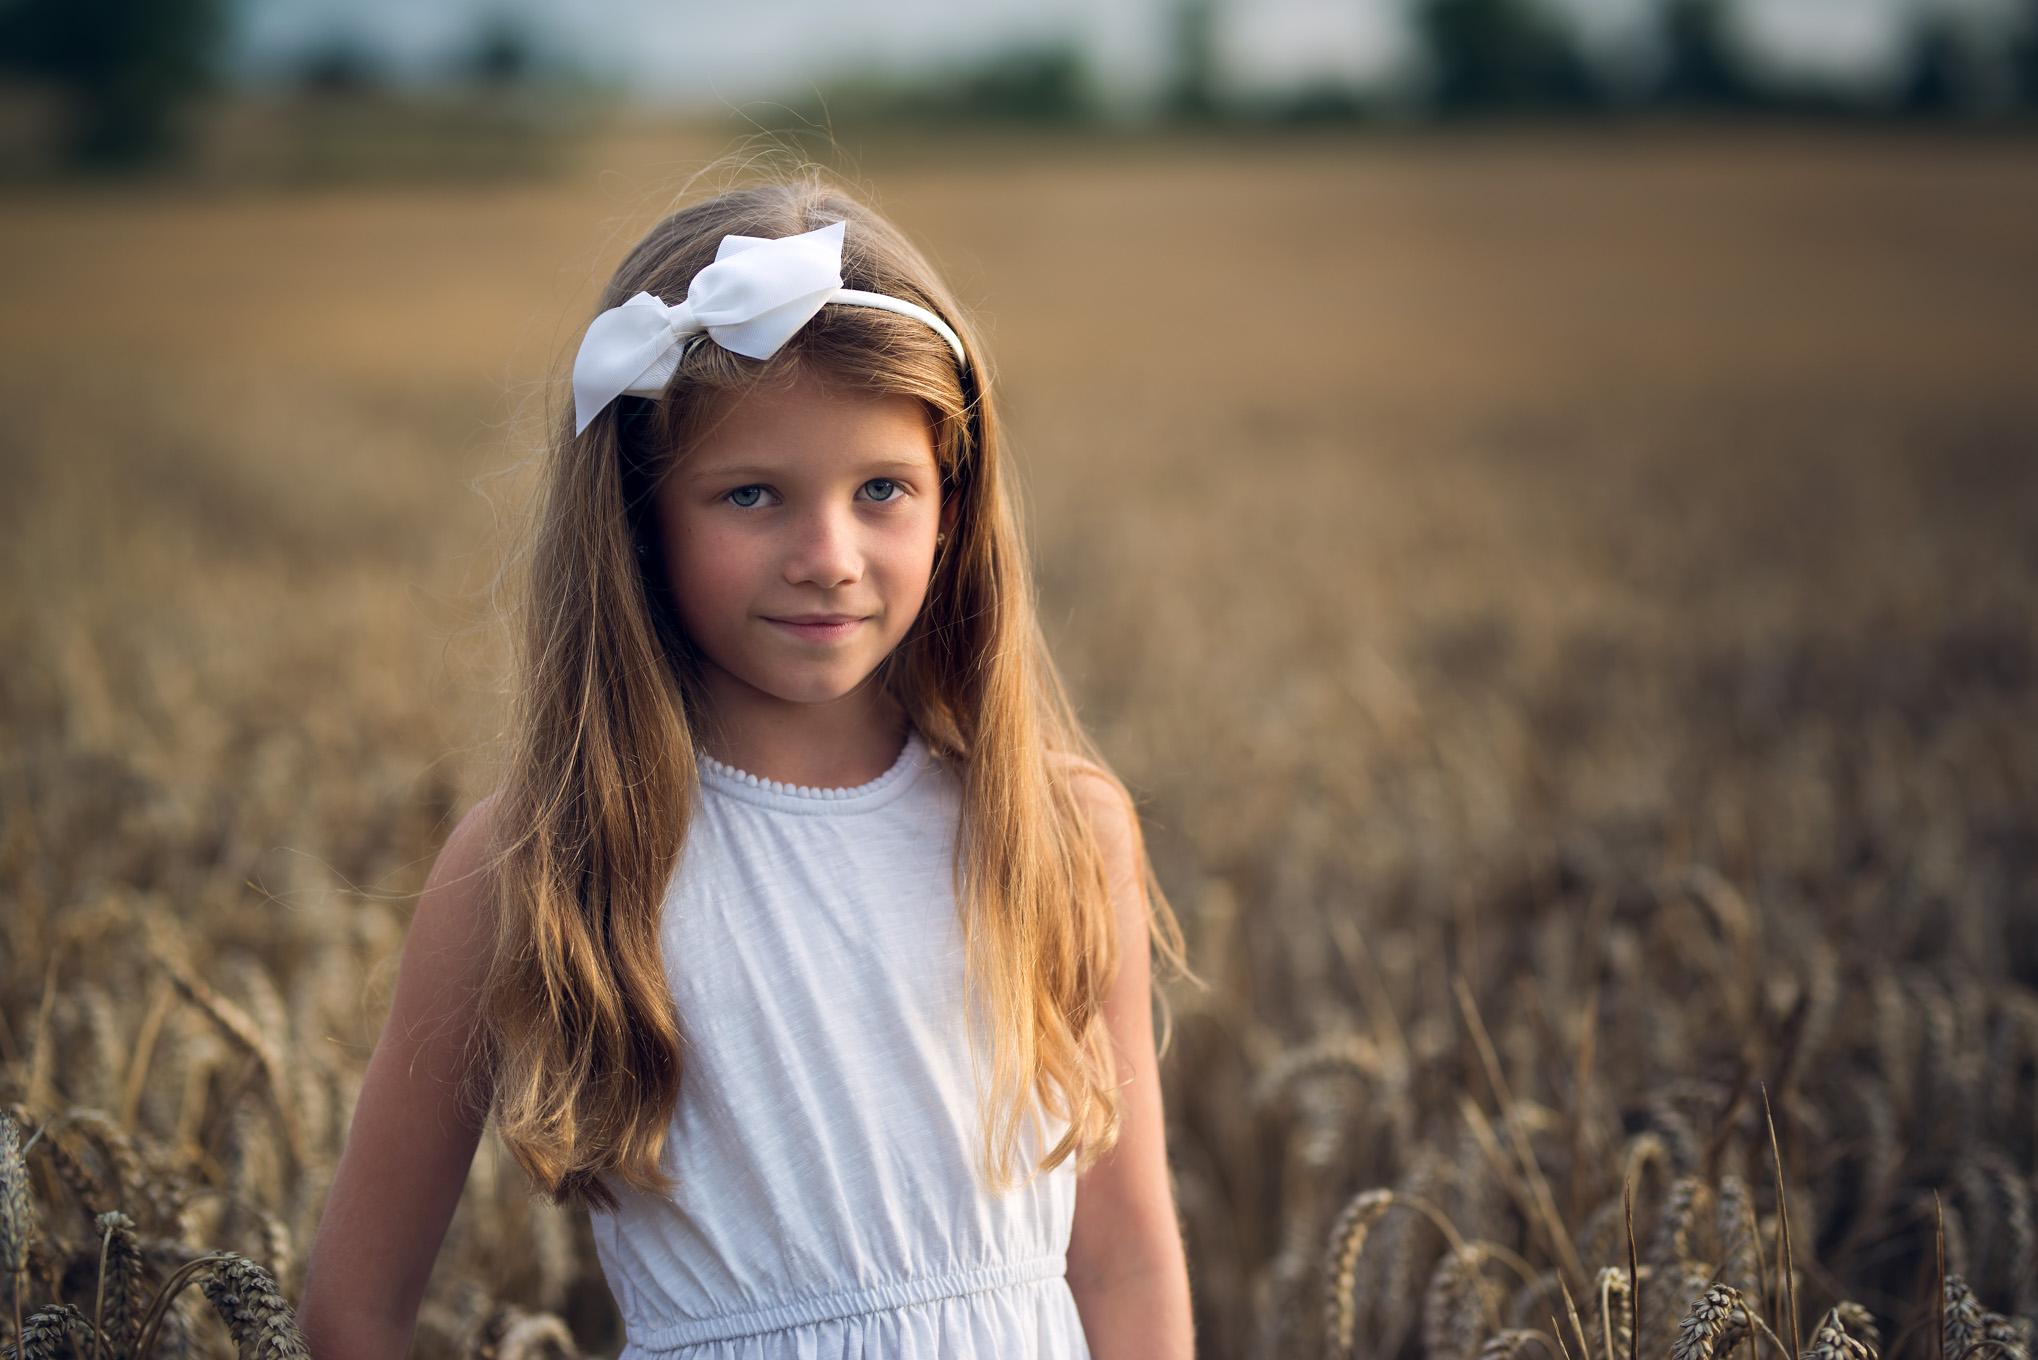 Golden hour portrait of girl in white dress | Children's Photography